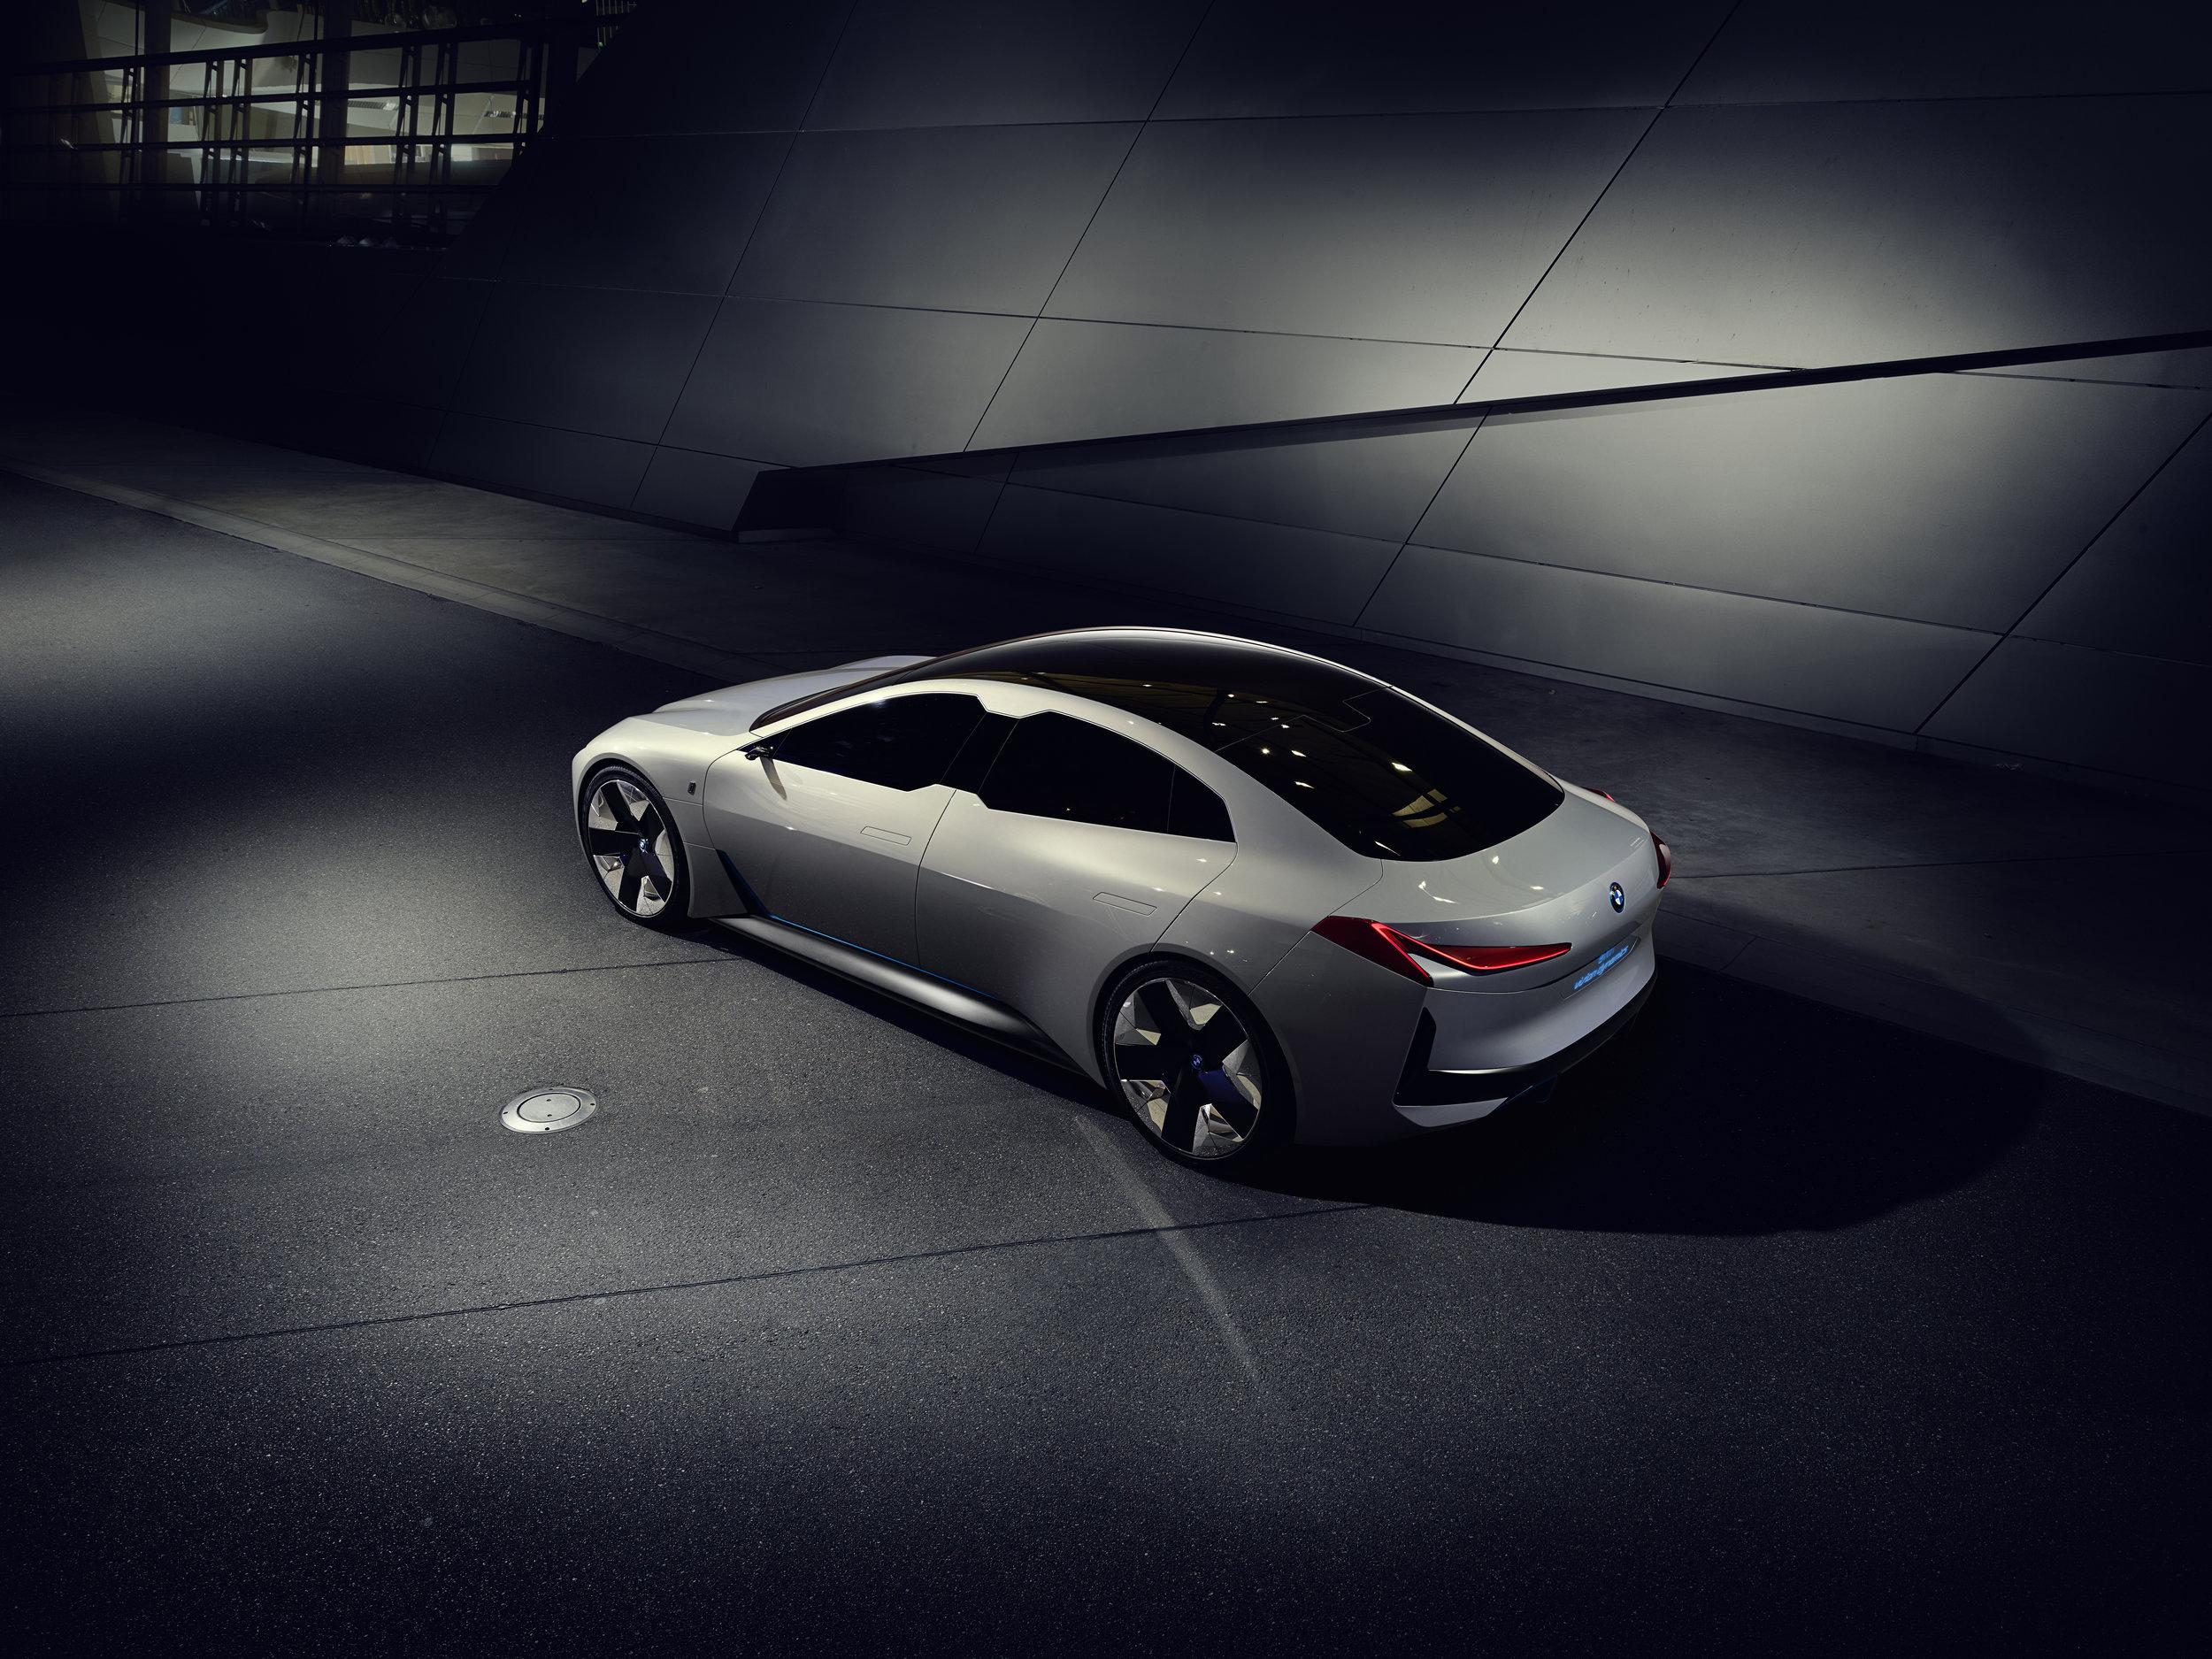 BMW_i_Vision_Dynamics_Real_V2_008.jpg